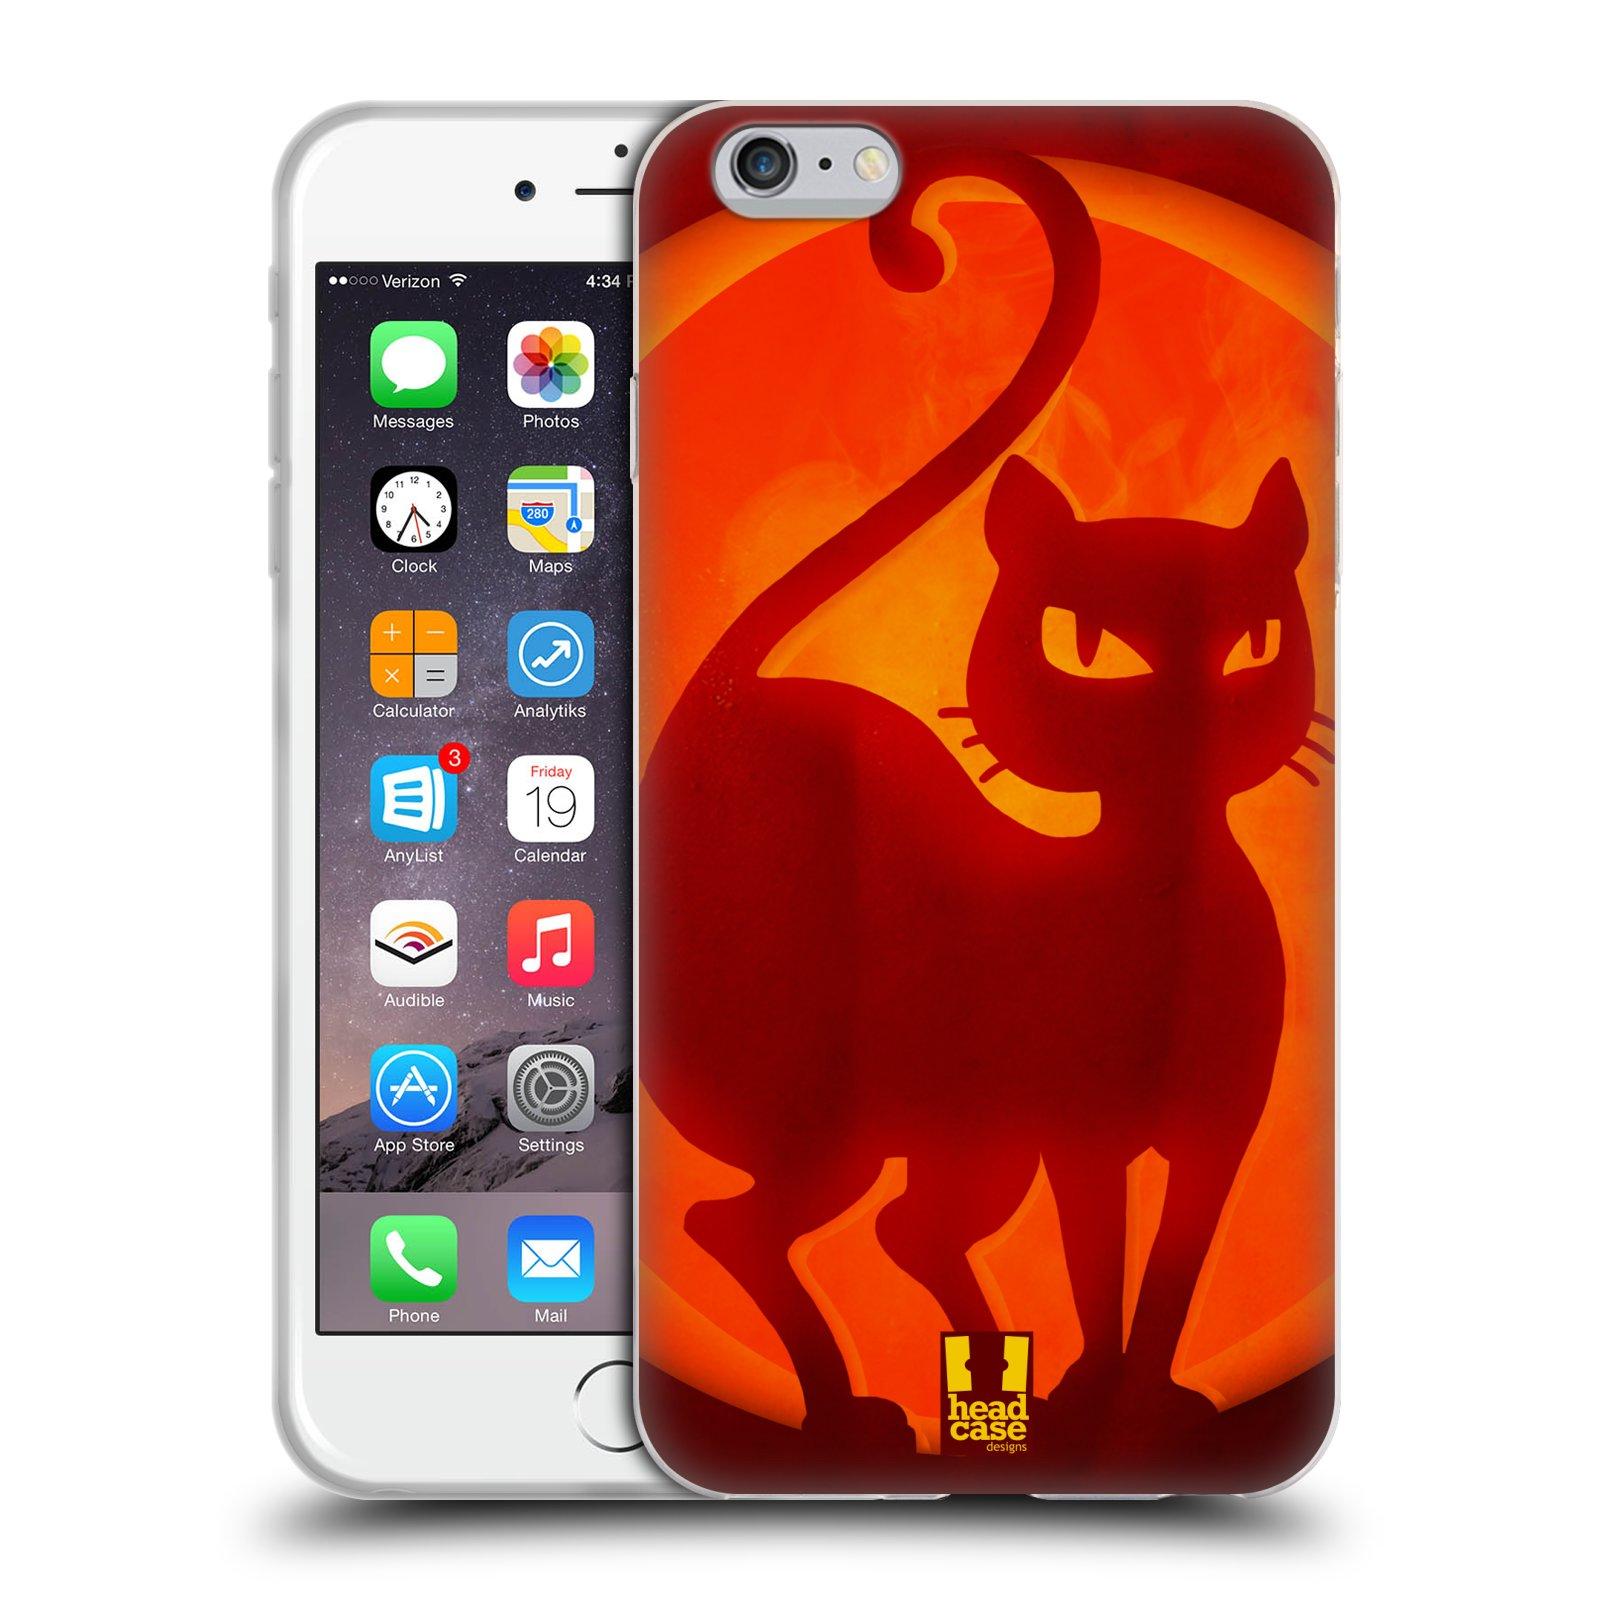 HEAD CASE silikonový obal na mobil Apple Iphone 6 PLUS/ 6S PLUS vzor odraz svítilny oranžová KOČKA